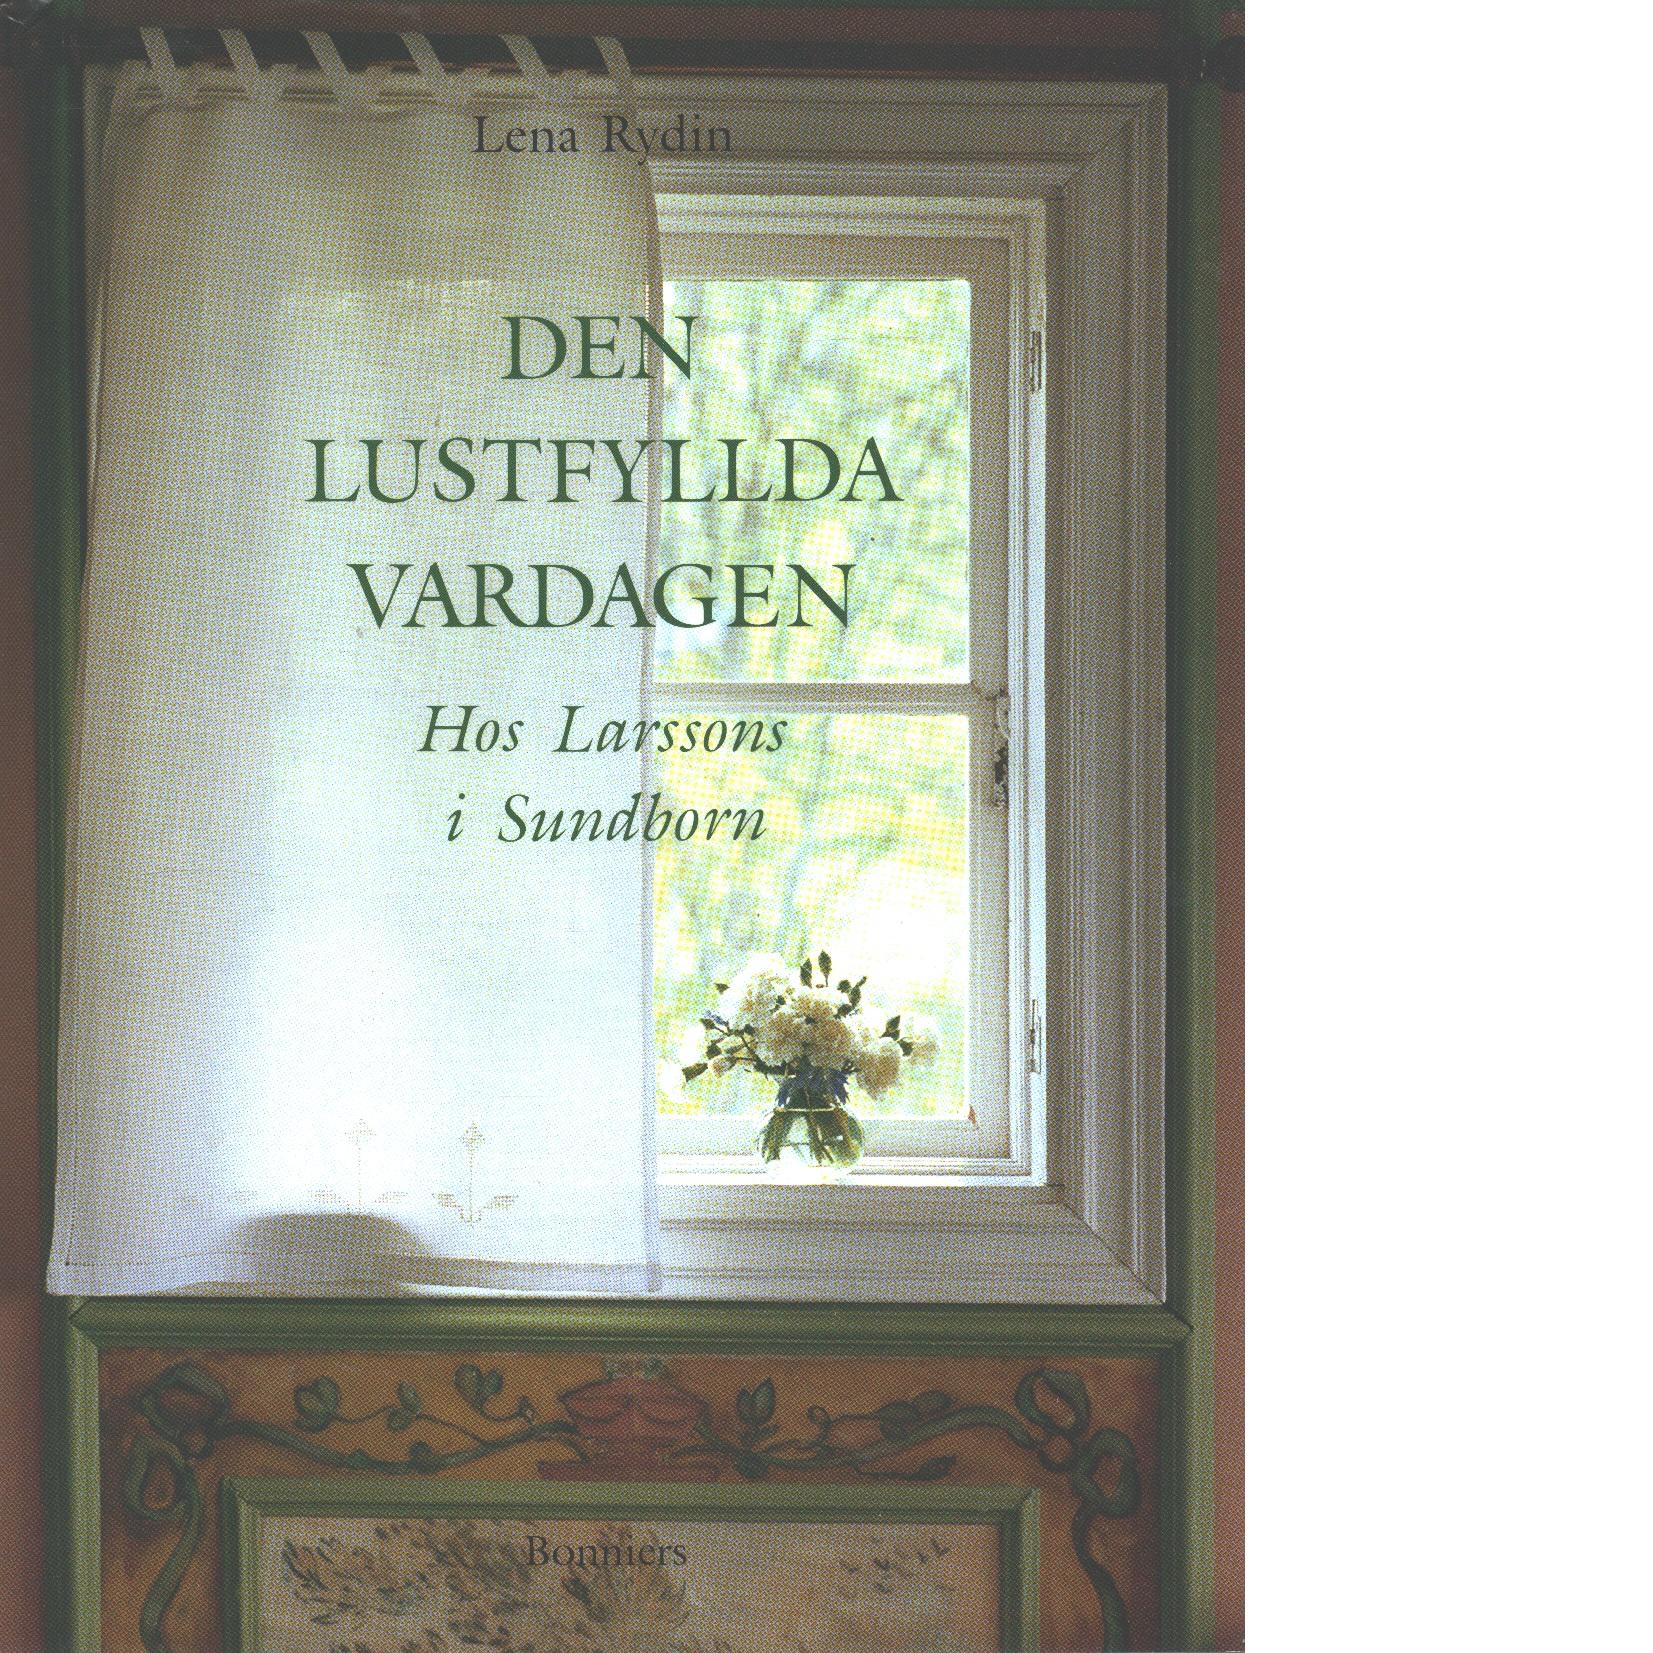 Den lustfyllda vardagen : hos Larssons i Sundborn - Rydin, Lena